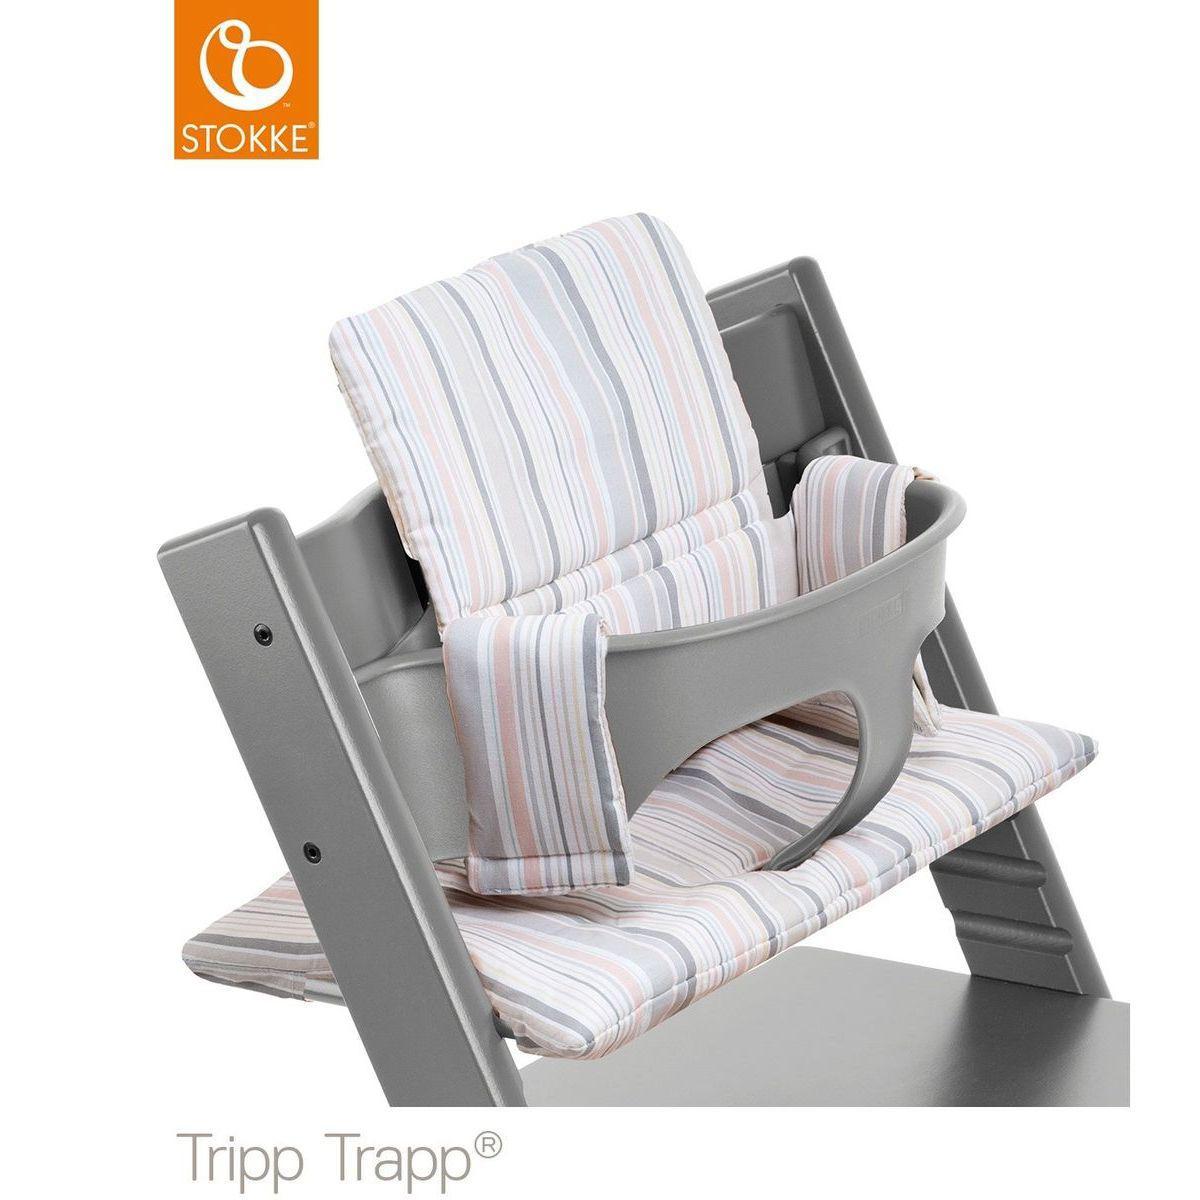 Tripp lu Kids TempêteAbitare Baby Set Trapp Stokke Chaise Haute Gris JFK1cTl